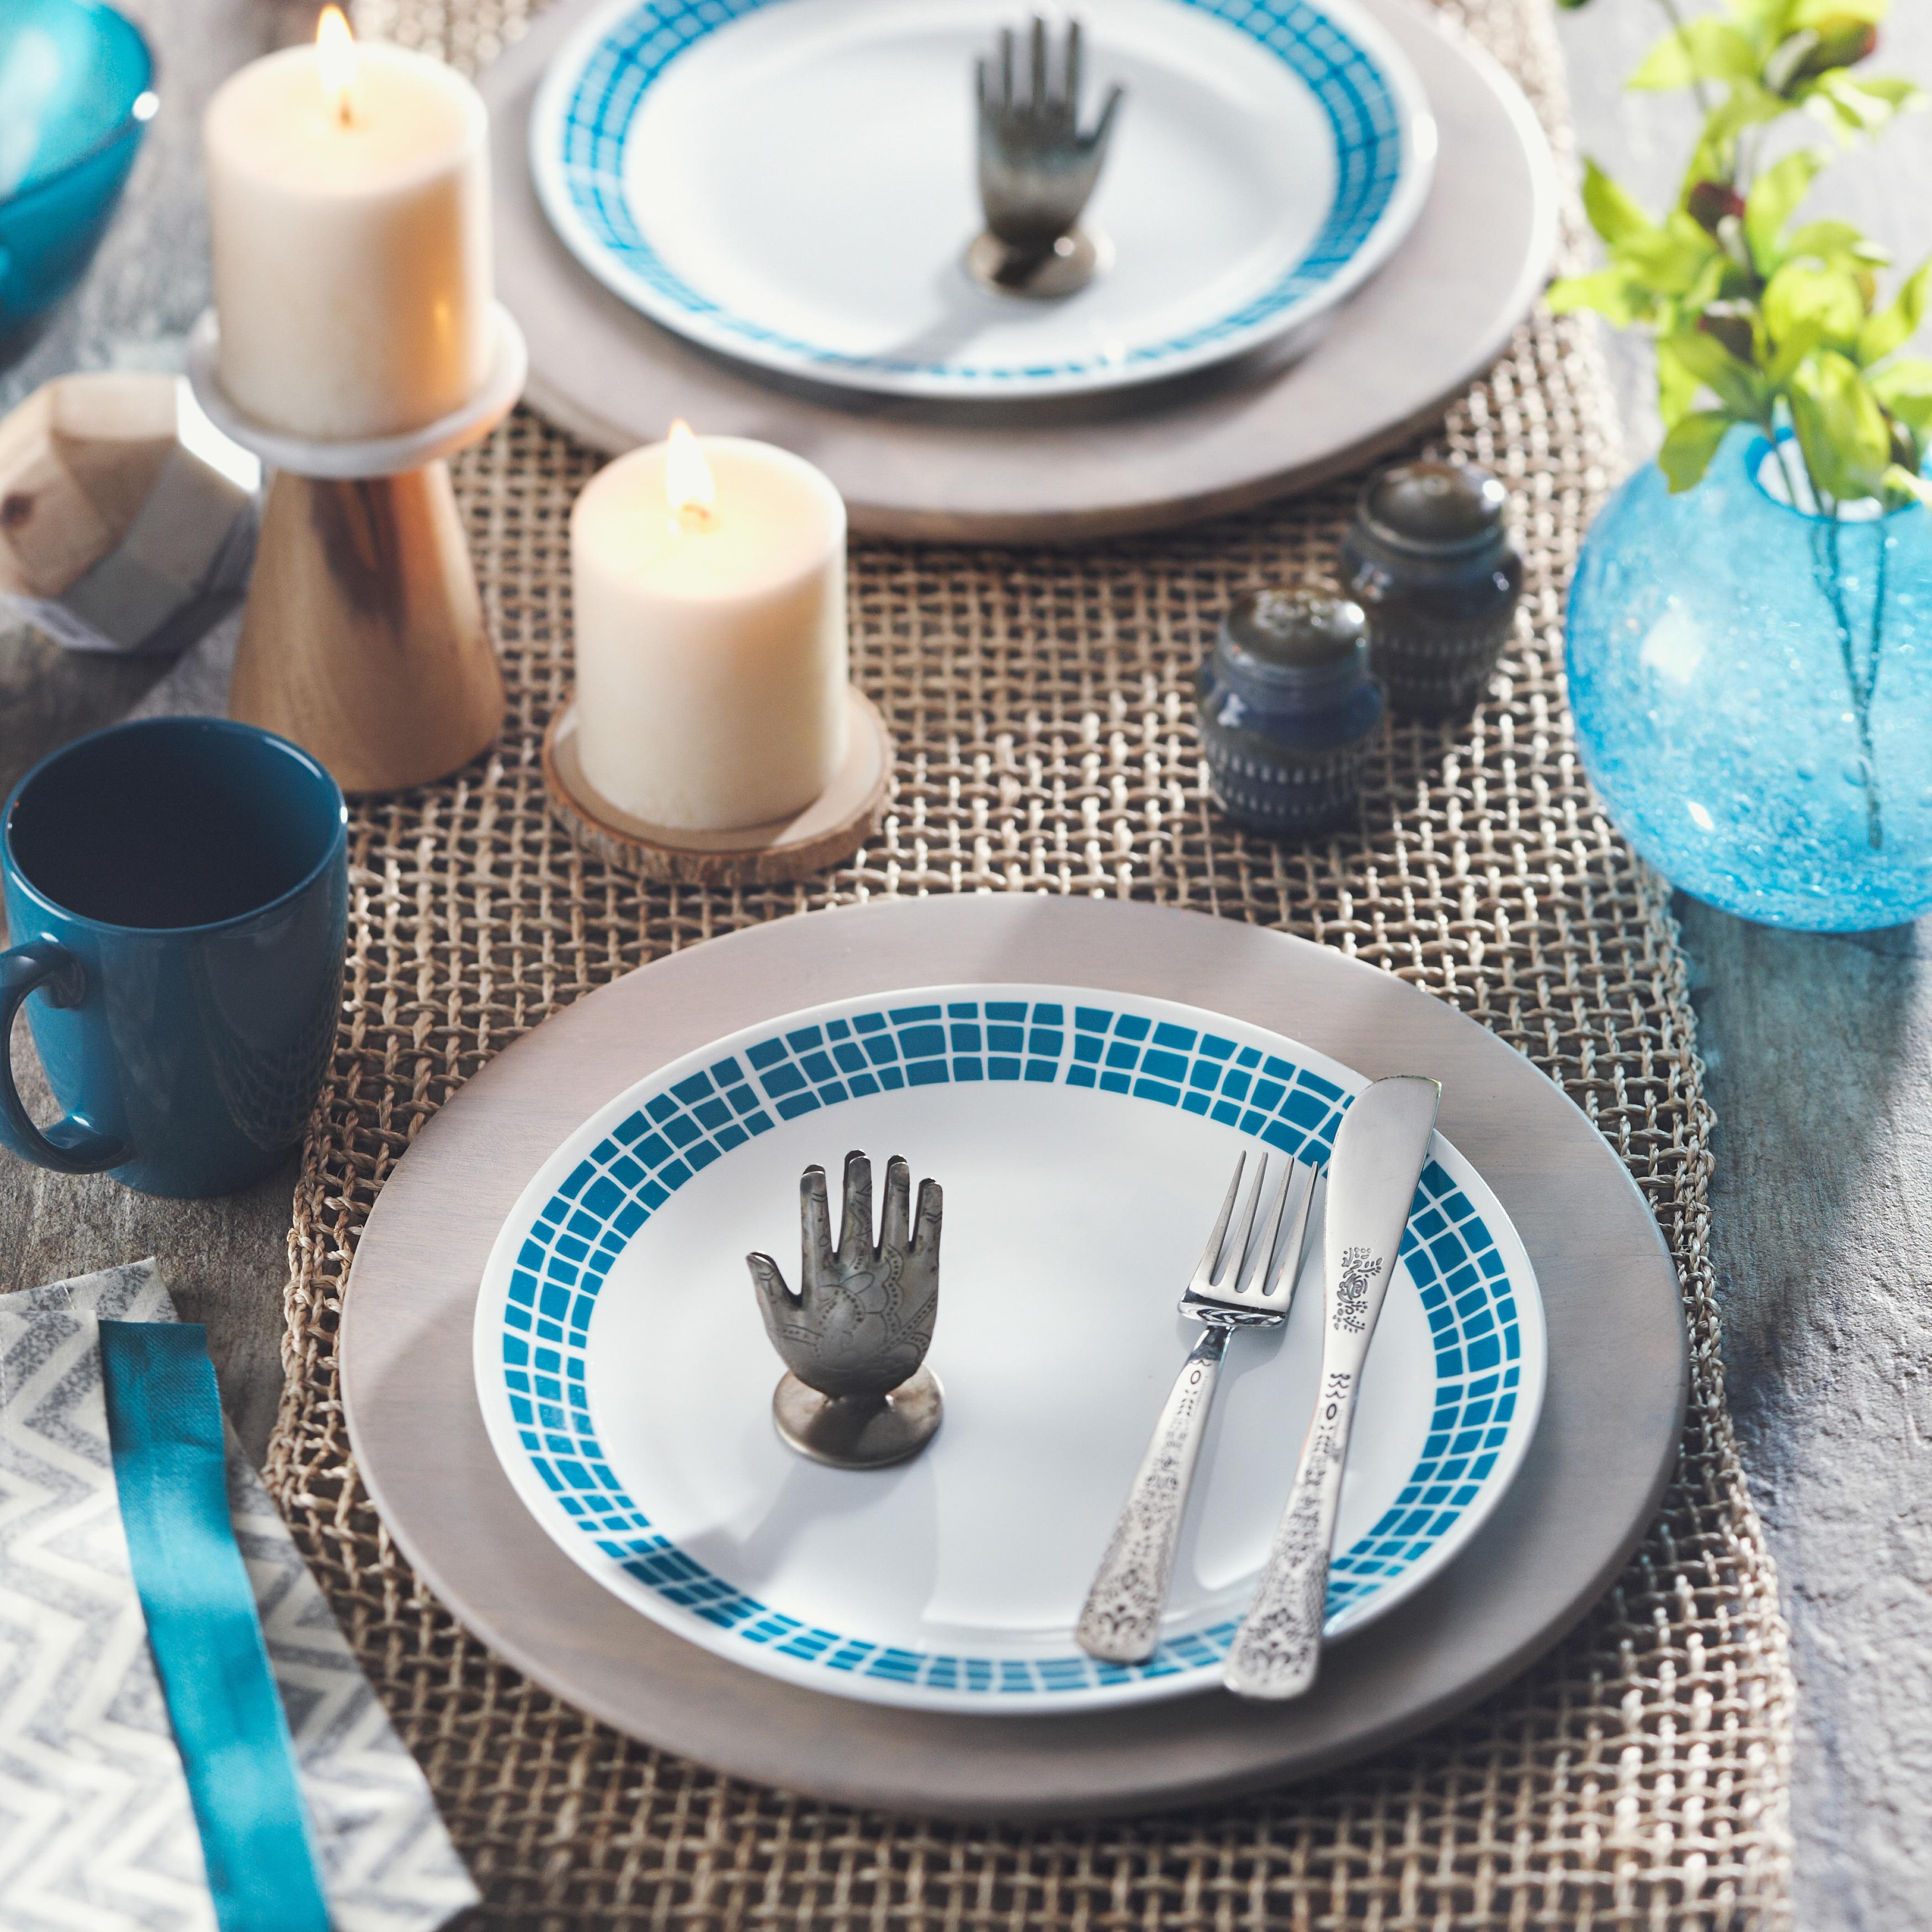 Corelle Livingware Aqua Tiles 16-piece Dinnerware Set (Wh...